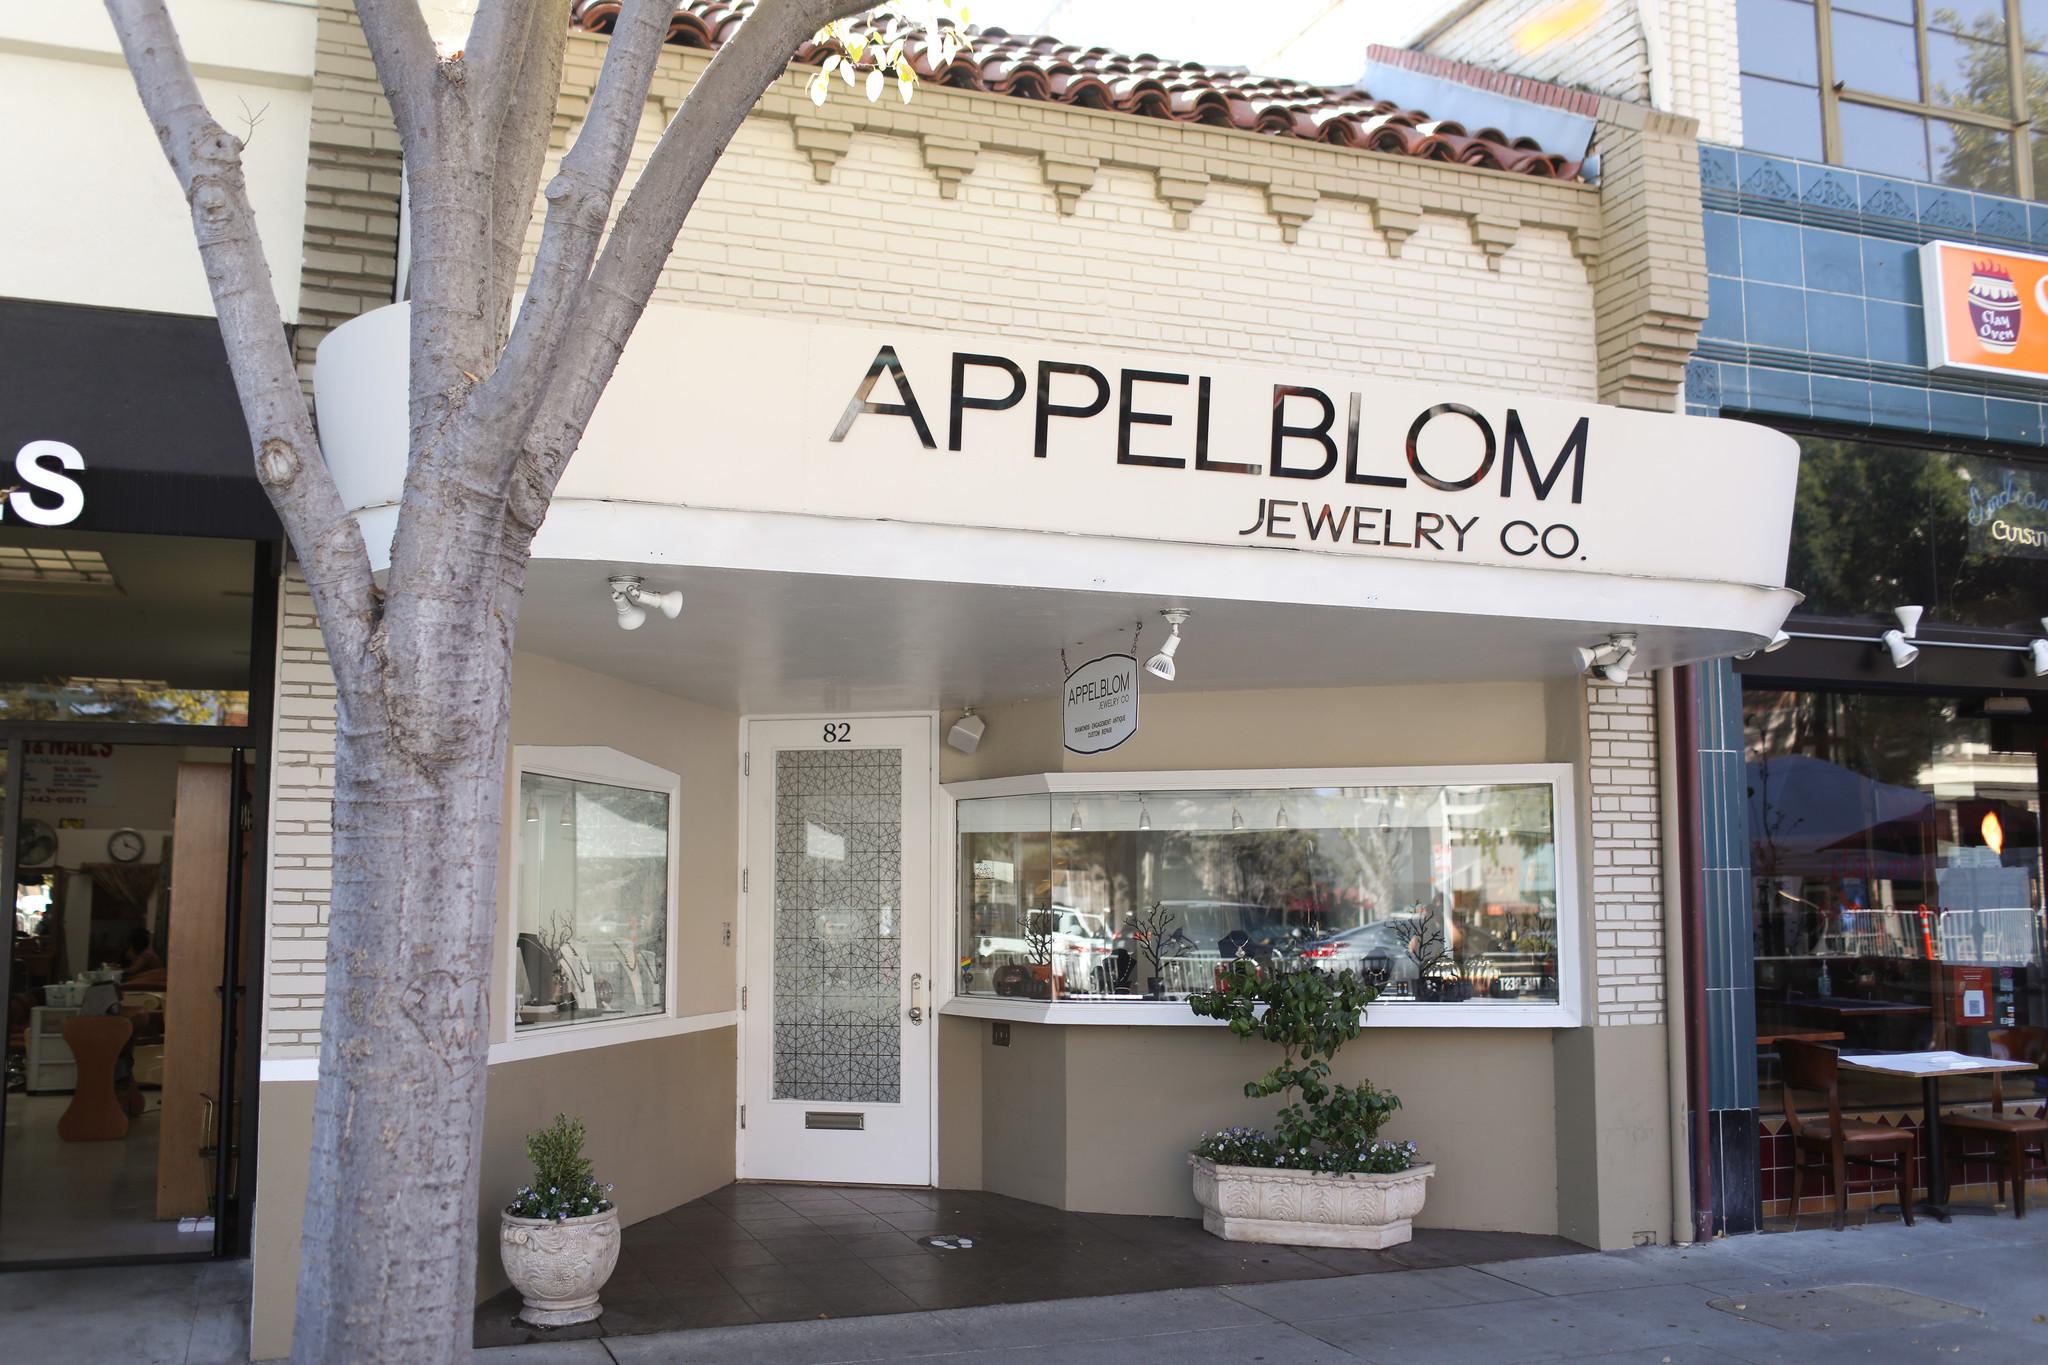 Appelblom Jewelry Co